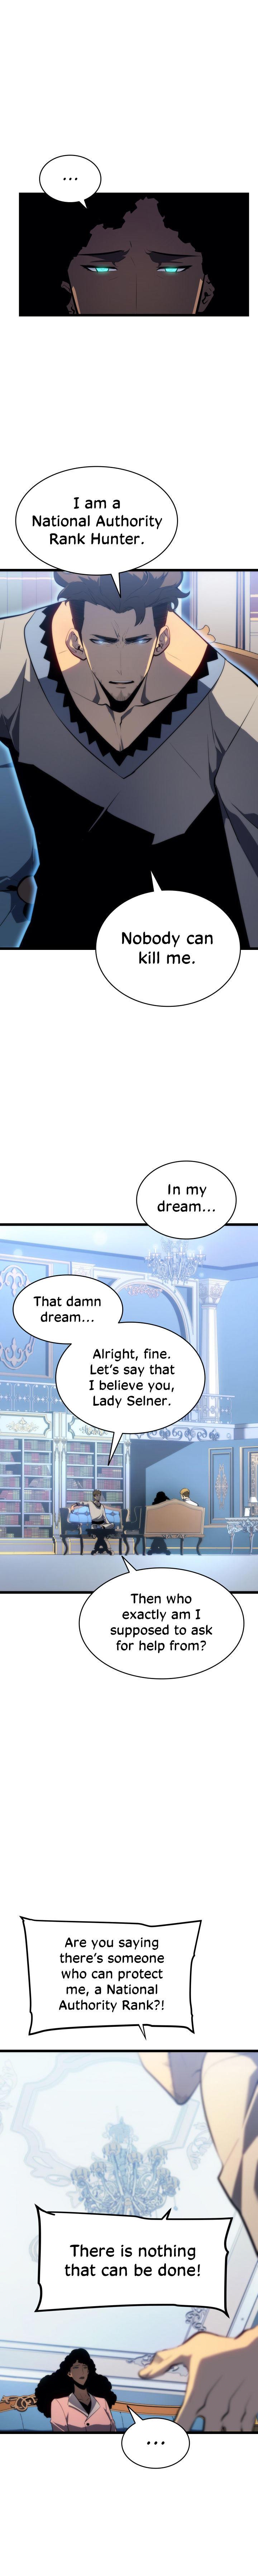 Solo Leveling Vol.2 Chapter 139 page 3 - Mangakakalots.com